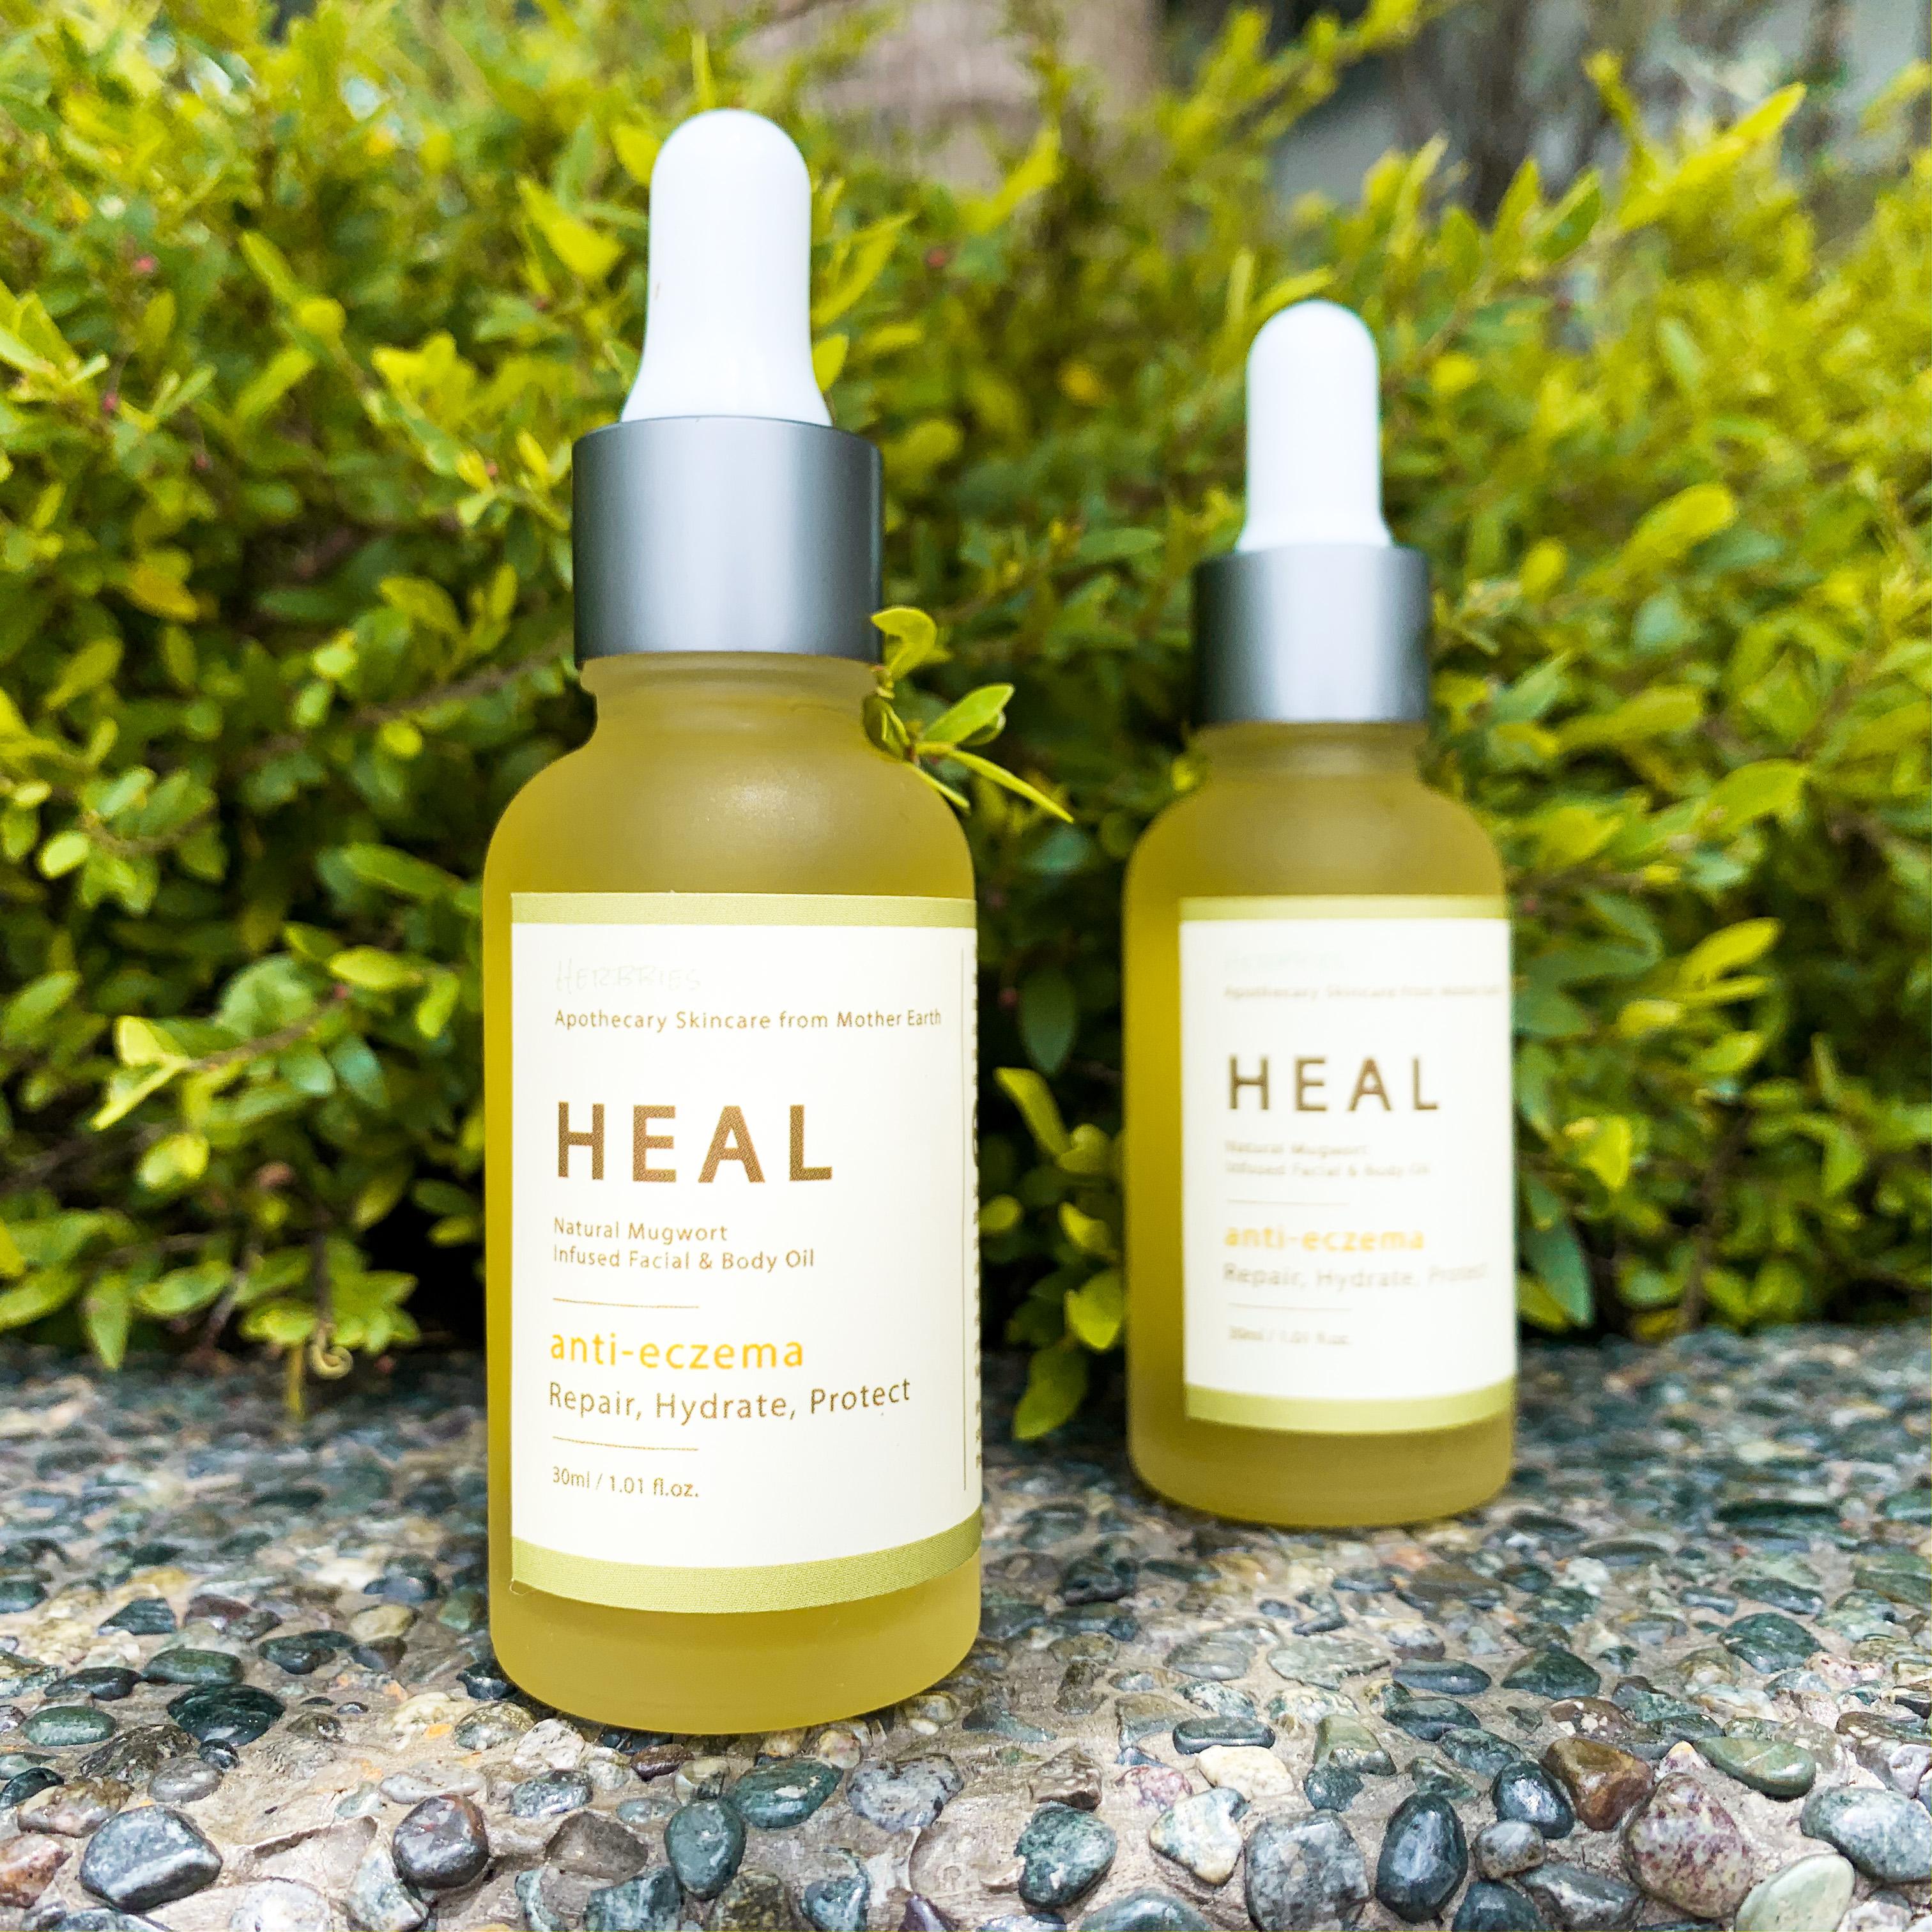 HEAL艾草-牛皮癬護膚油